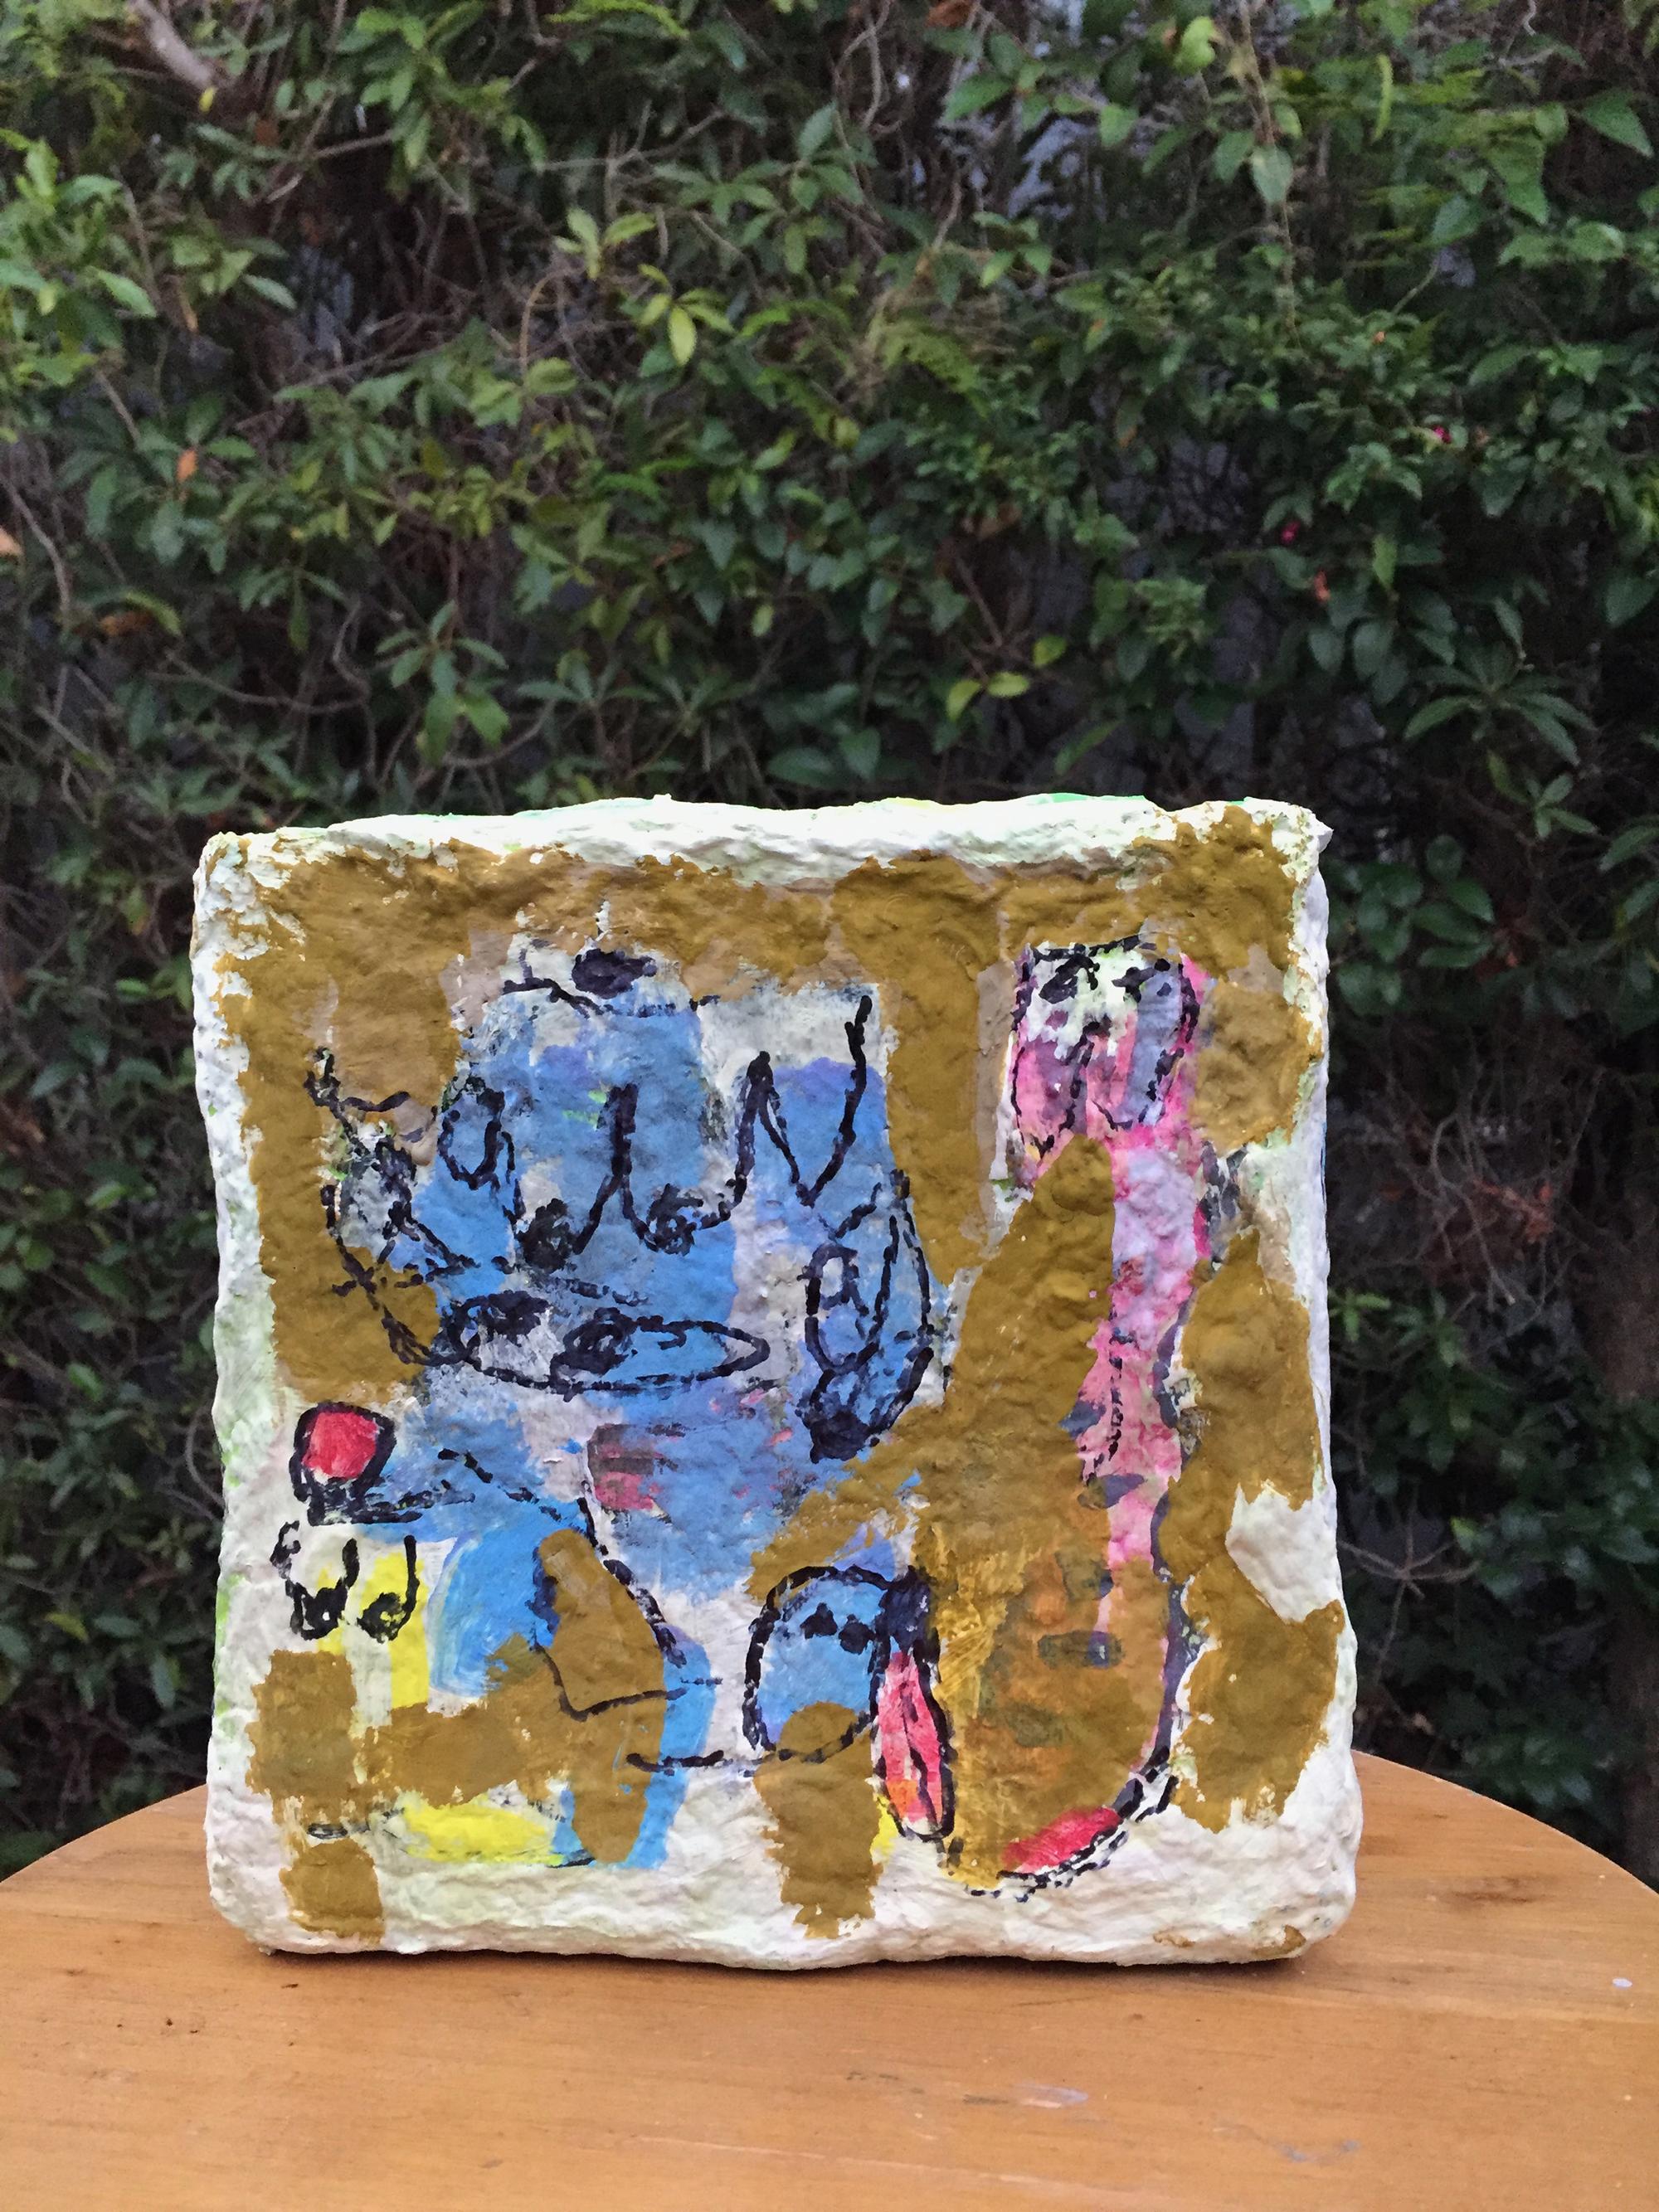 Julia_Schwartz_vessel_gouache, sharpie, handmade paper_8x8x3.jpg